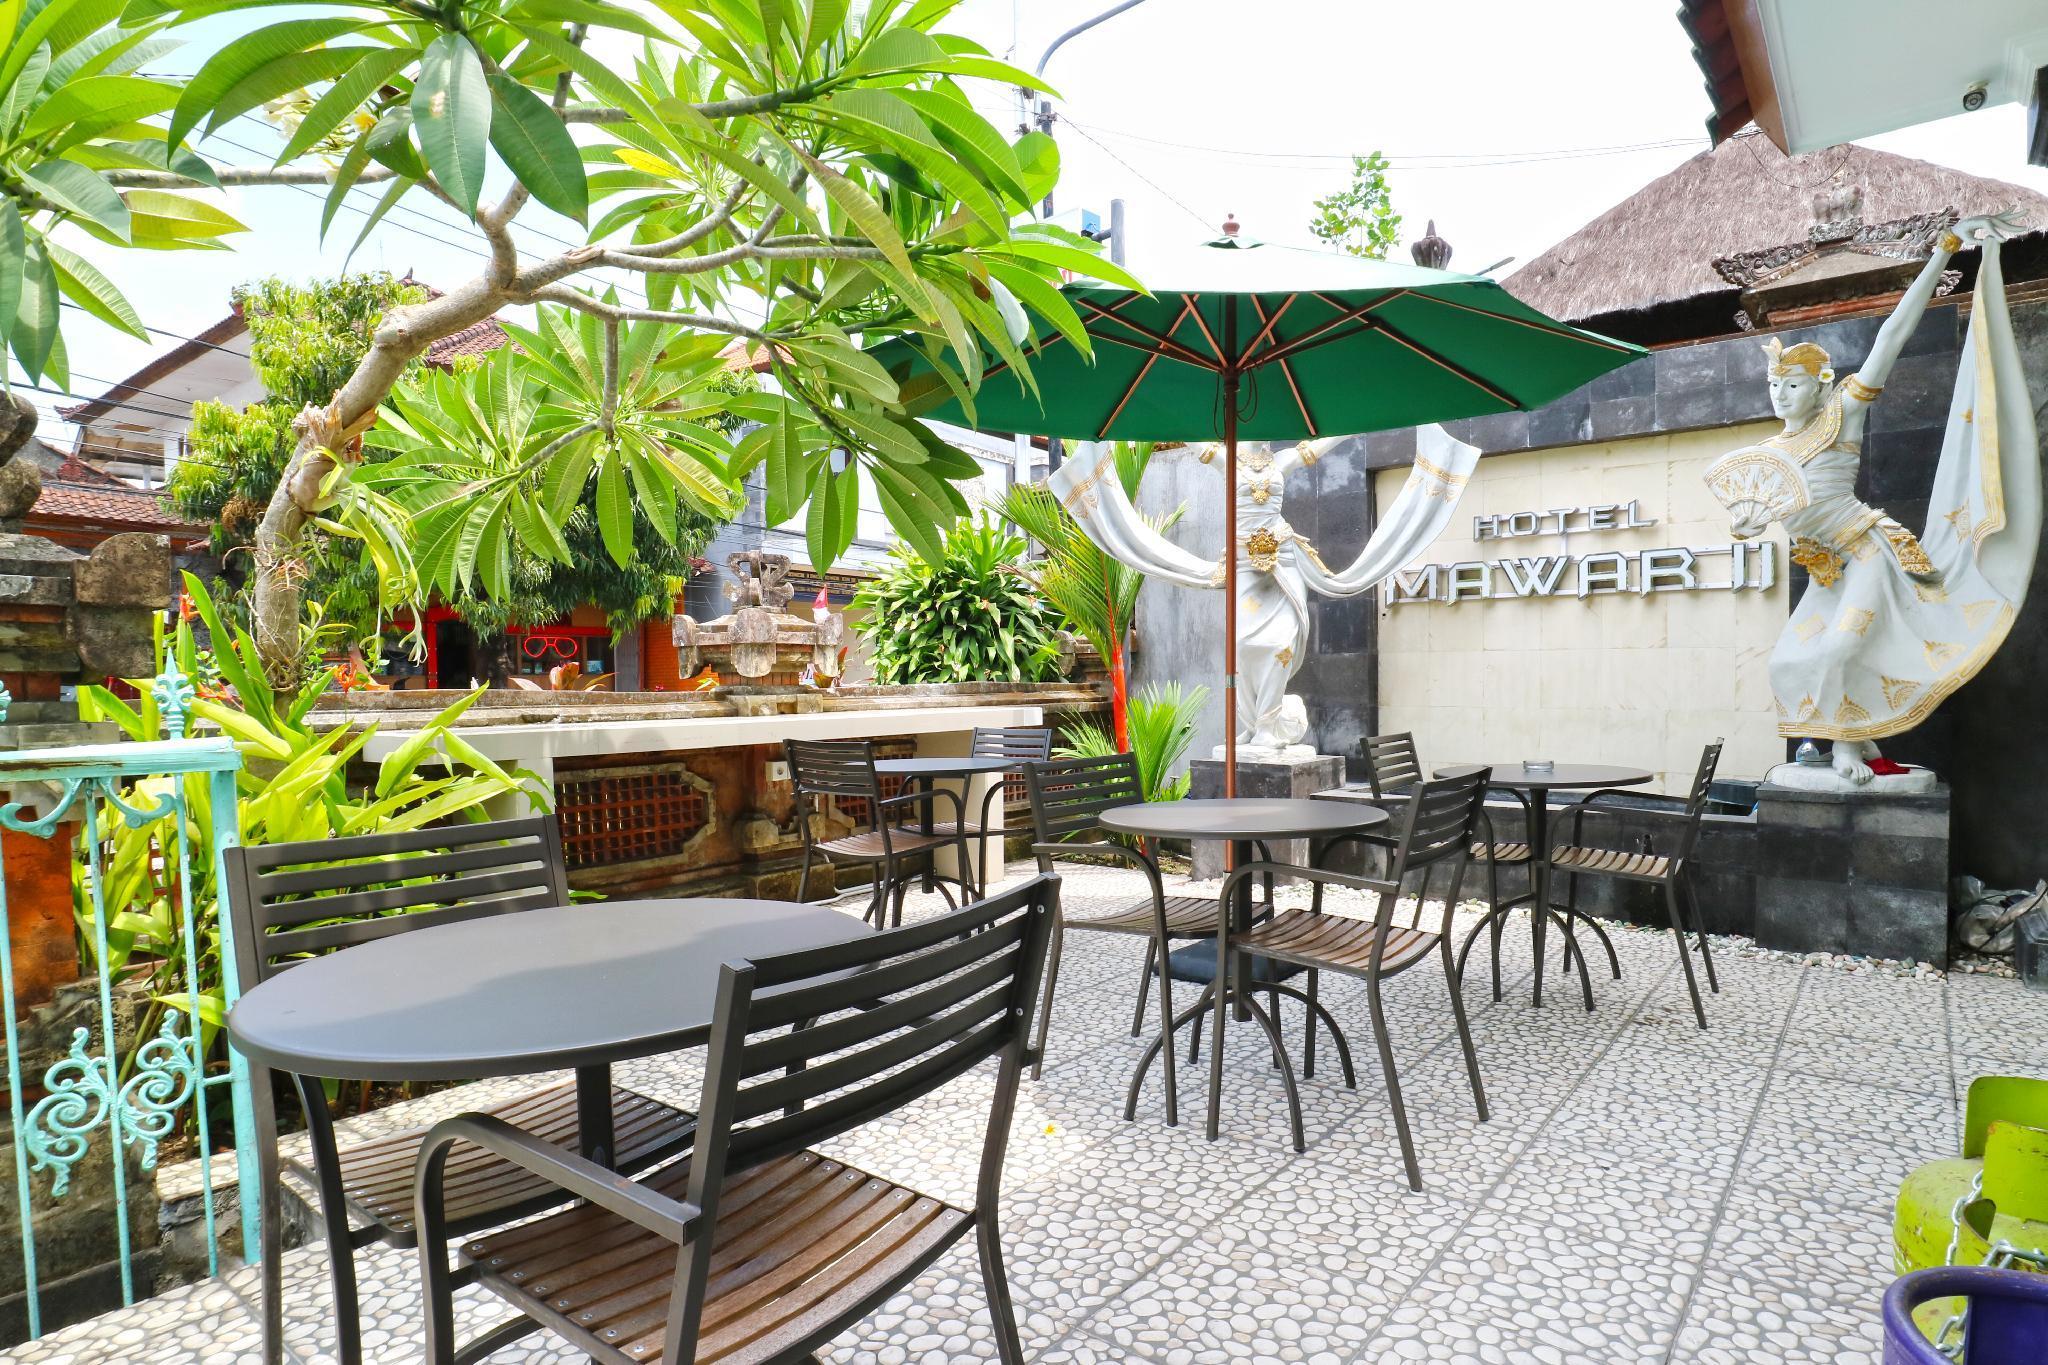 Hotel Mawar II, Denpasar